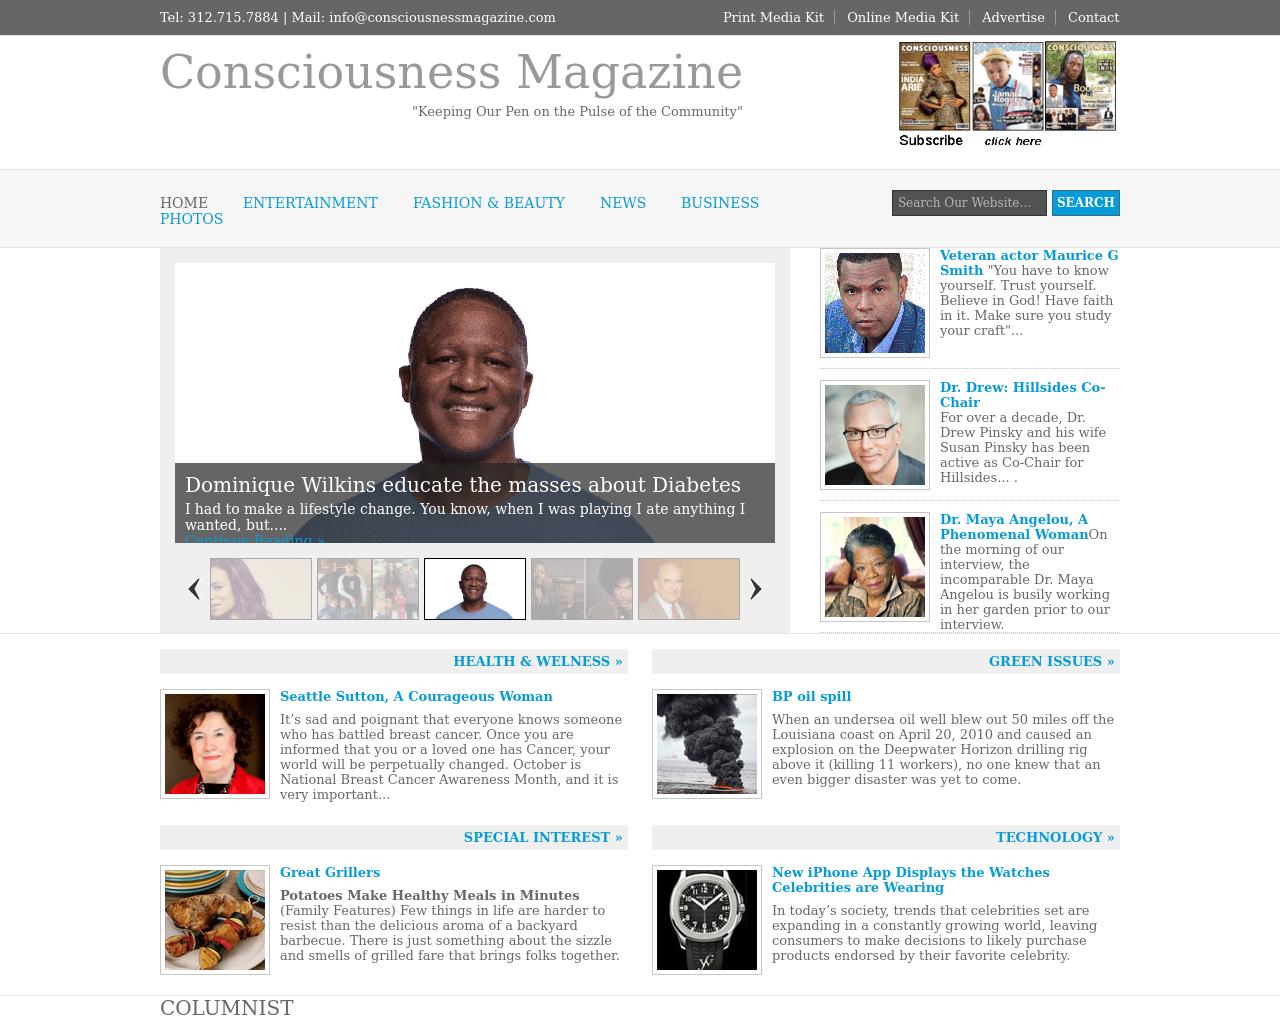 Consciousness-Magazine-Advertising-Reviews-Pricing